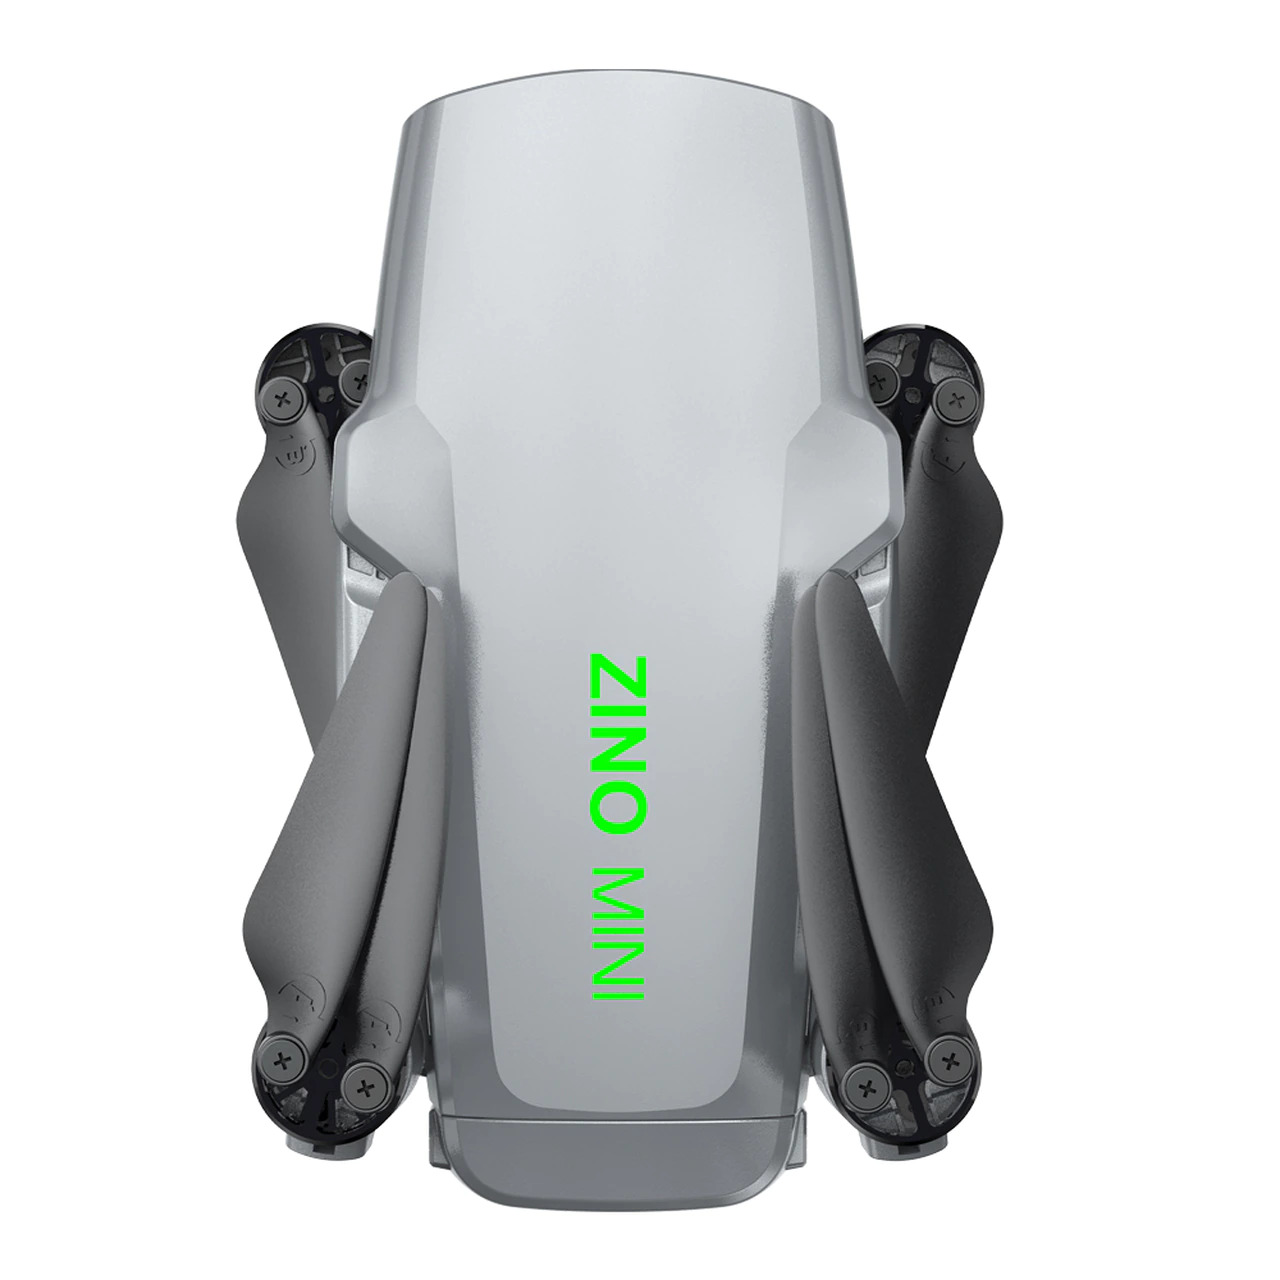 Hubsan Drone ZINO Mini PRO 249g GPS 10KM FPV 4K 30fps Camera 3-Axis Gimbal RC Quadcopter Discounts Code: LF15AS5OAPT5 3